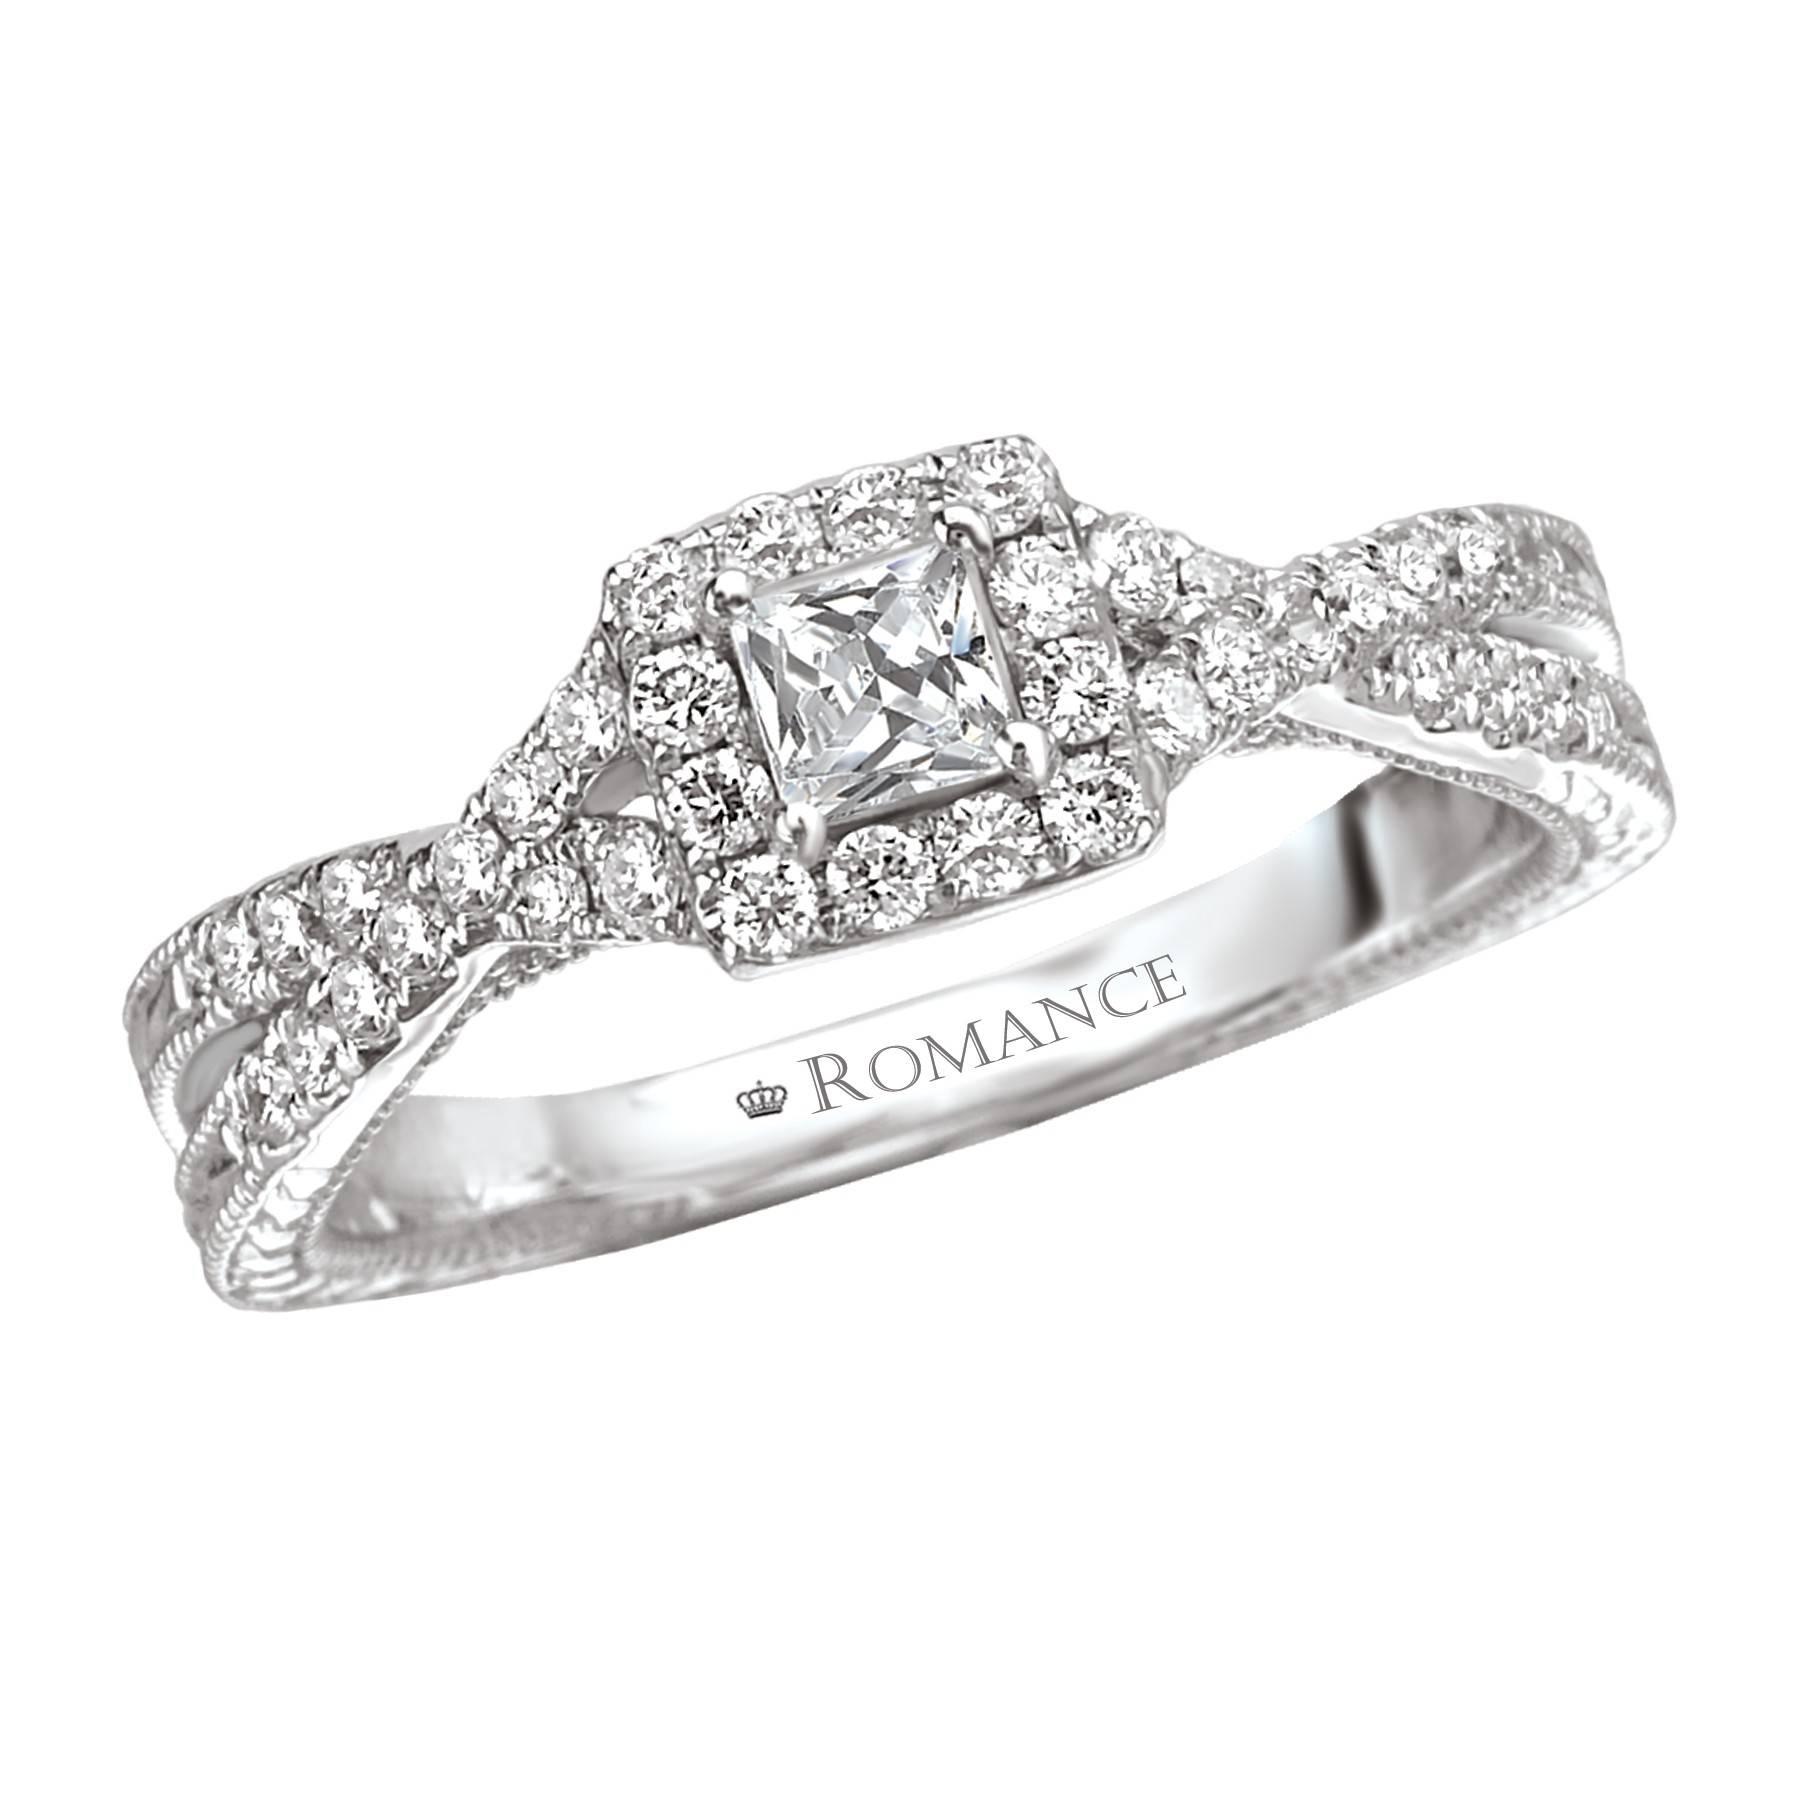 Wedding Rings : Princess Cut Wedding Ring Wraps Choosing The Regarding Princess Cut Wedding Rings For Women (View 3 of 15)